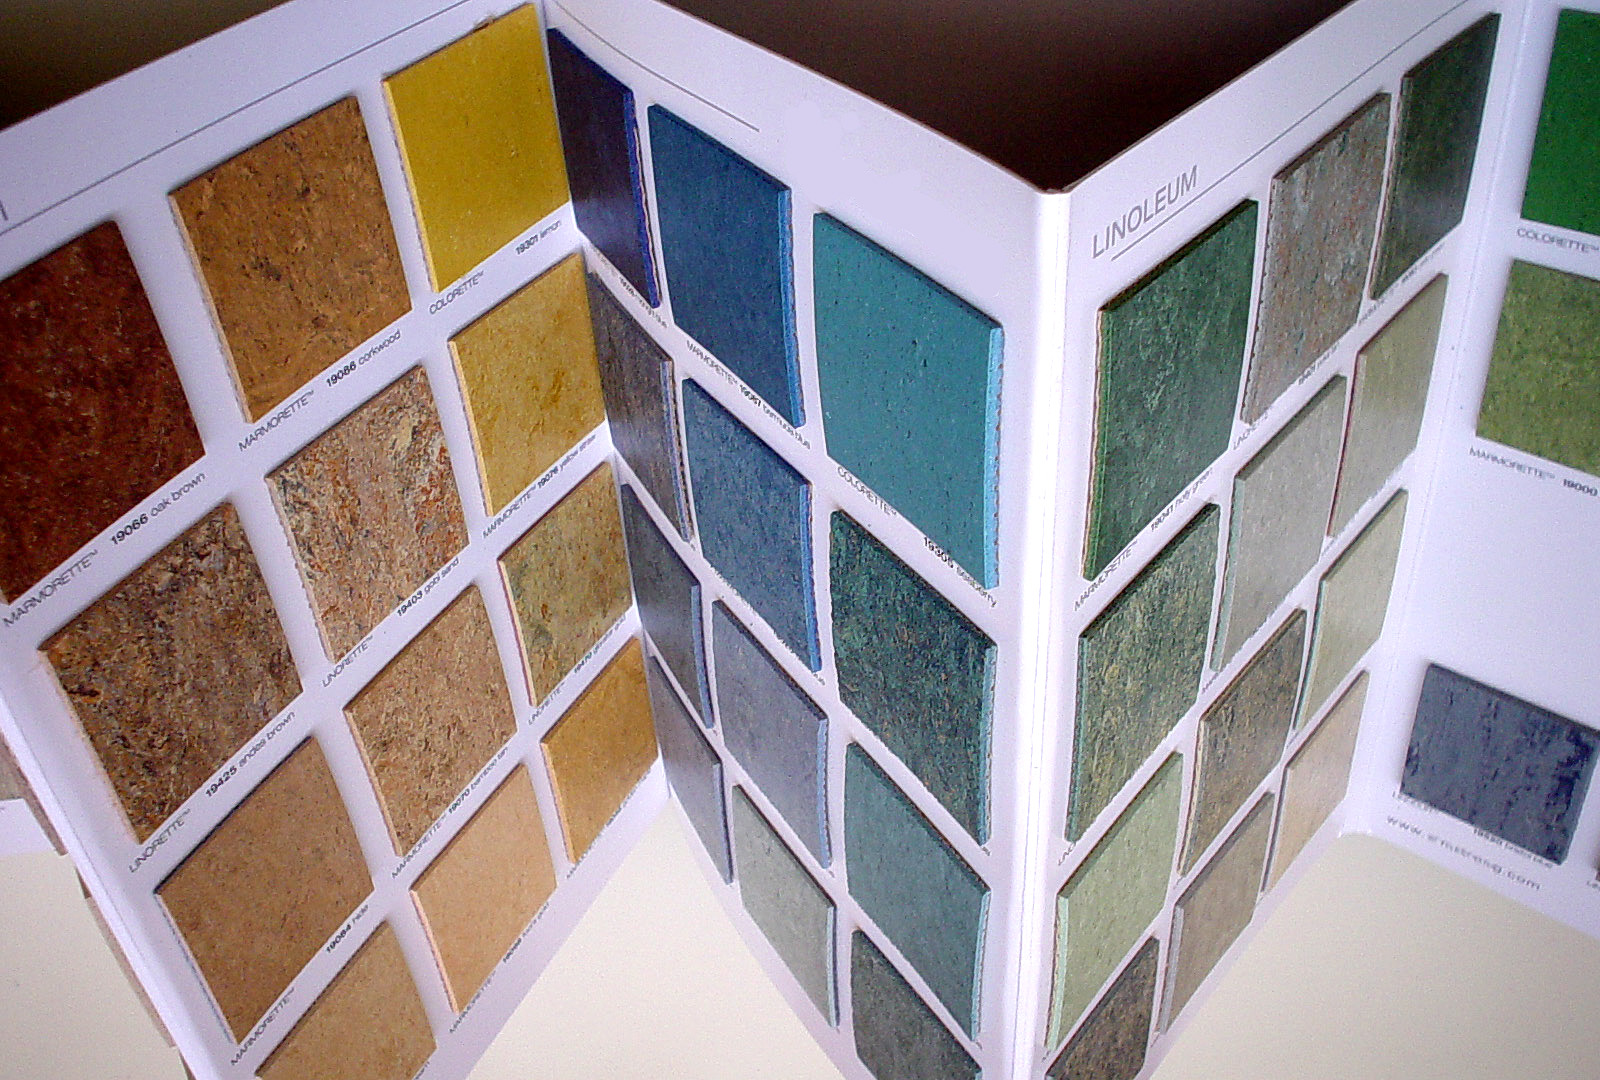 Inspiratie kleur interieurinbedrijf interieur for Interieur kleur